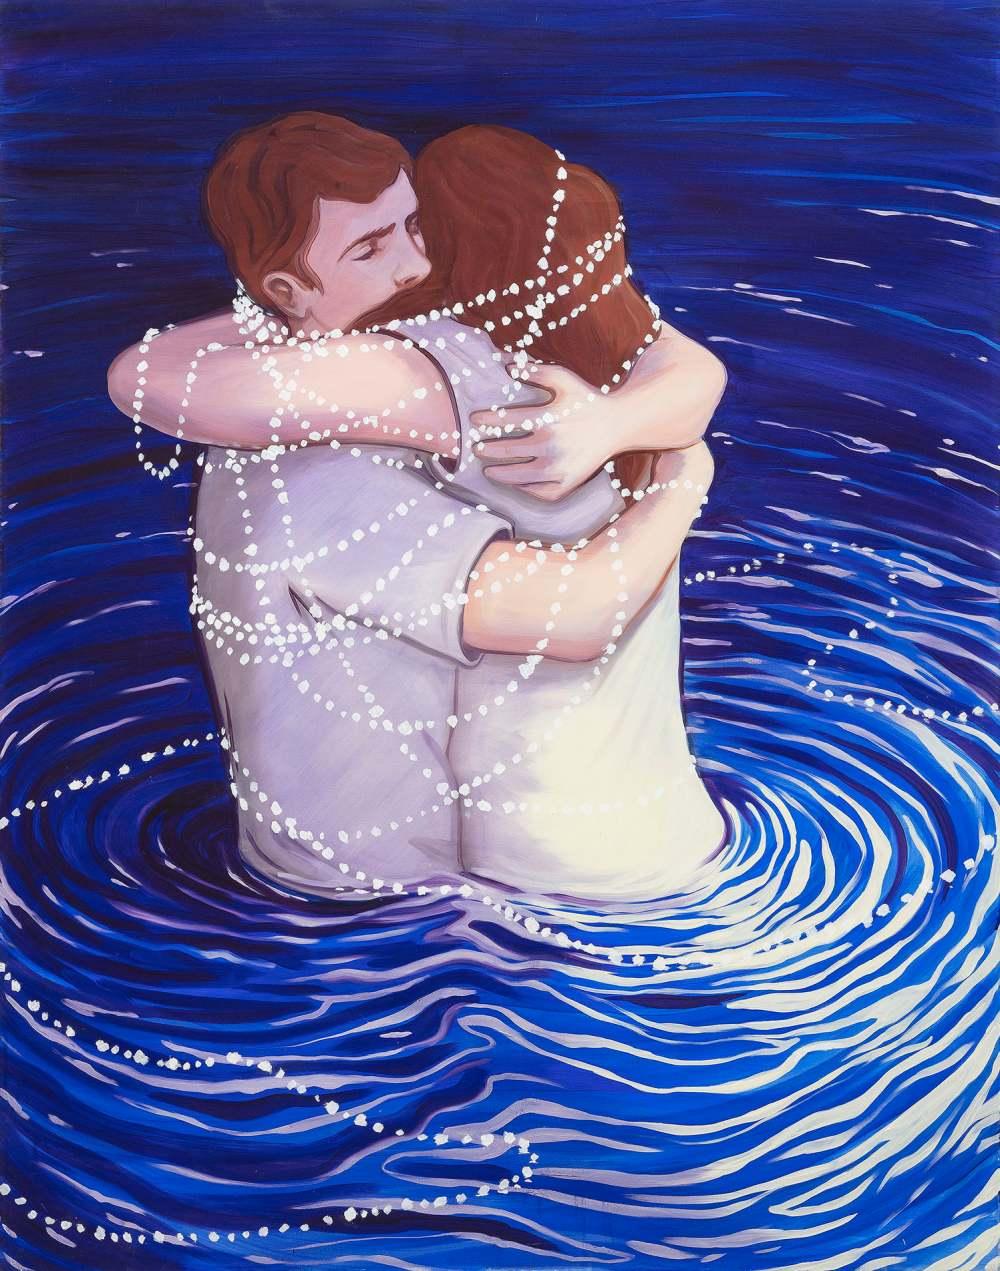 La nécessité d'un câlin, oil on canvas, 130x100cm, 2017 Lise Stoufflet   Alba Herrero   Mujeres Mirando Mujeres